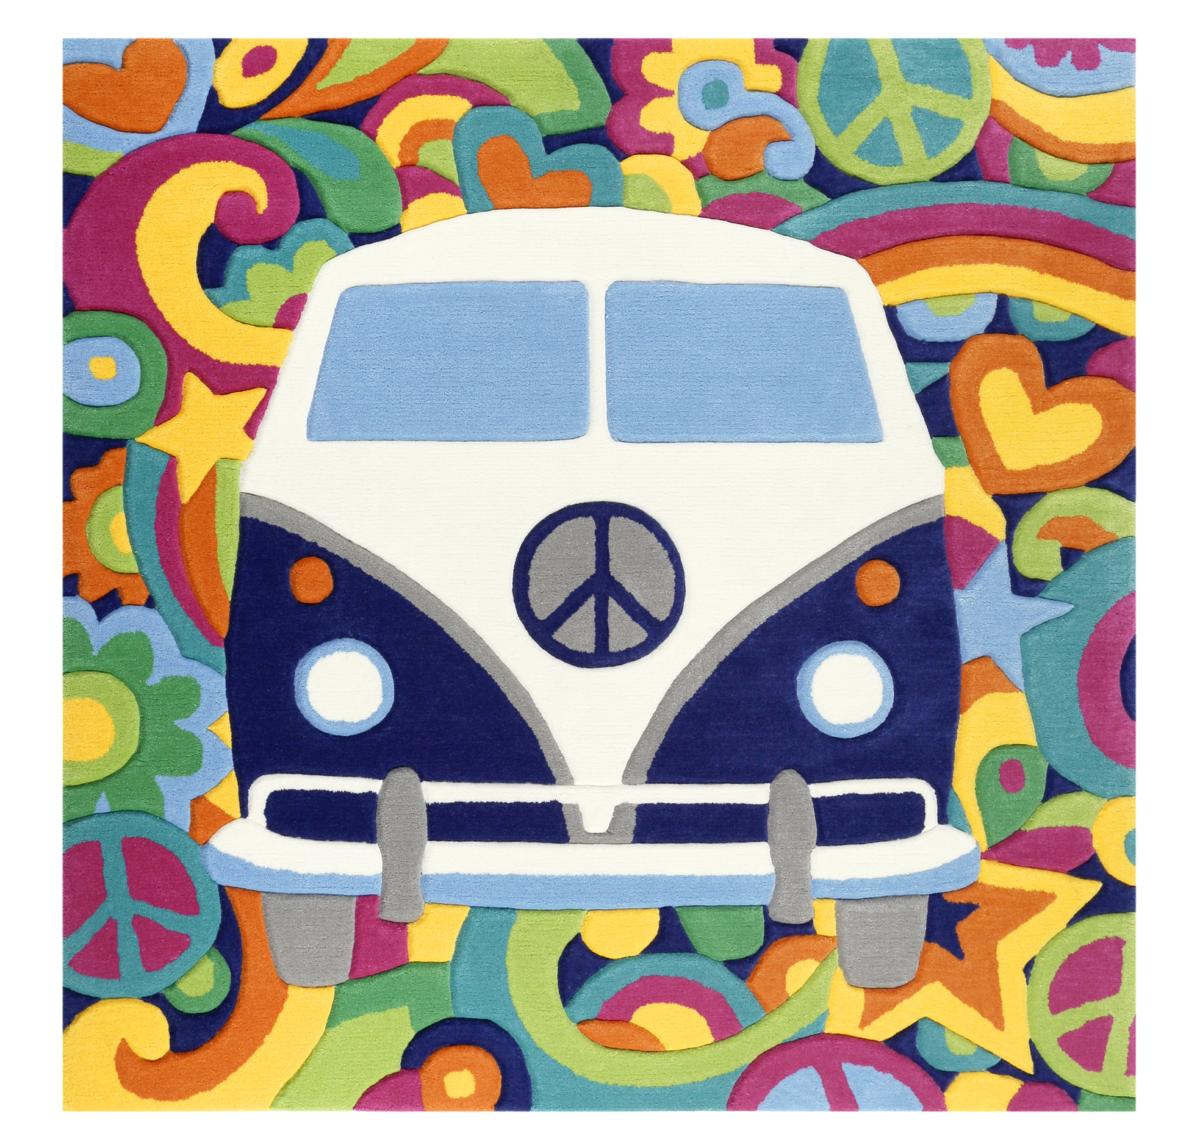 MH4240_DoodleBully_produziert_doodle-carpet